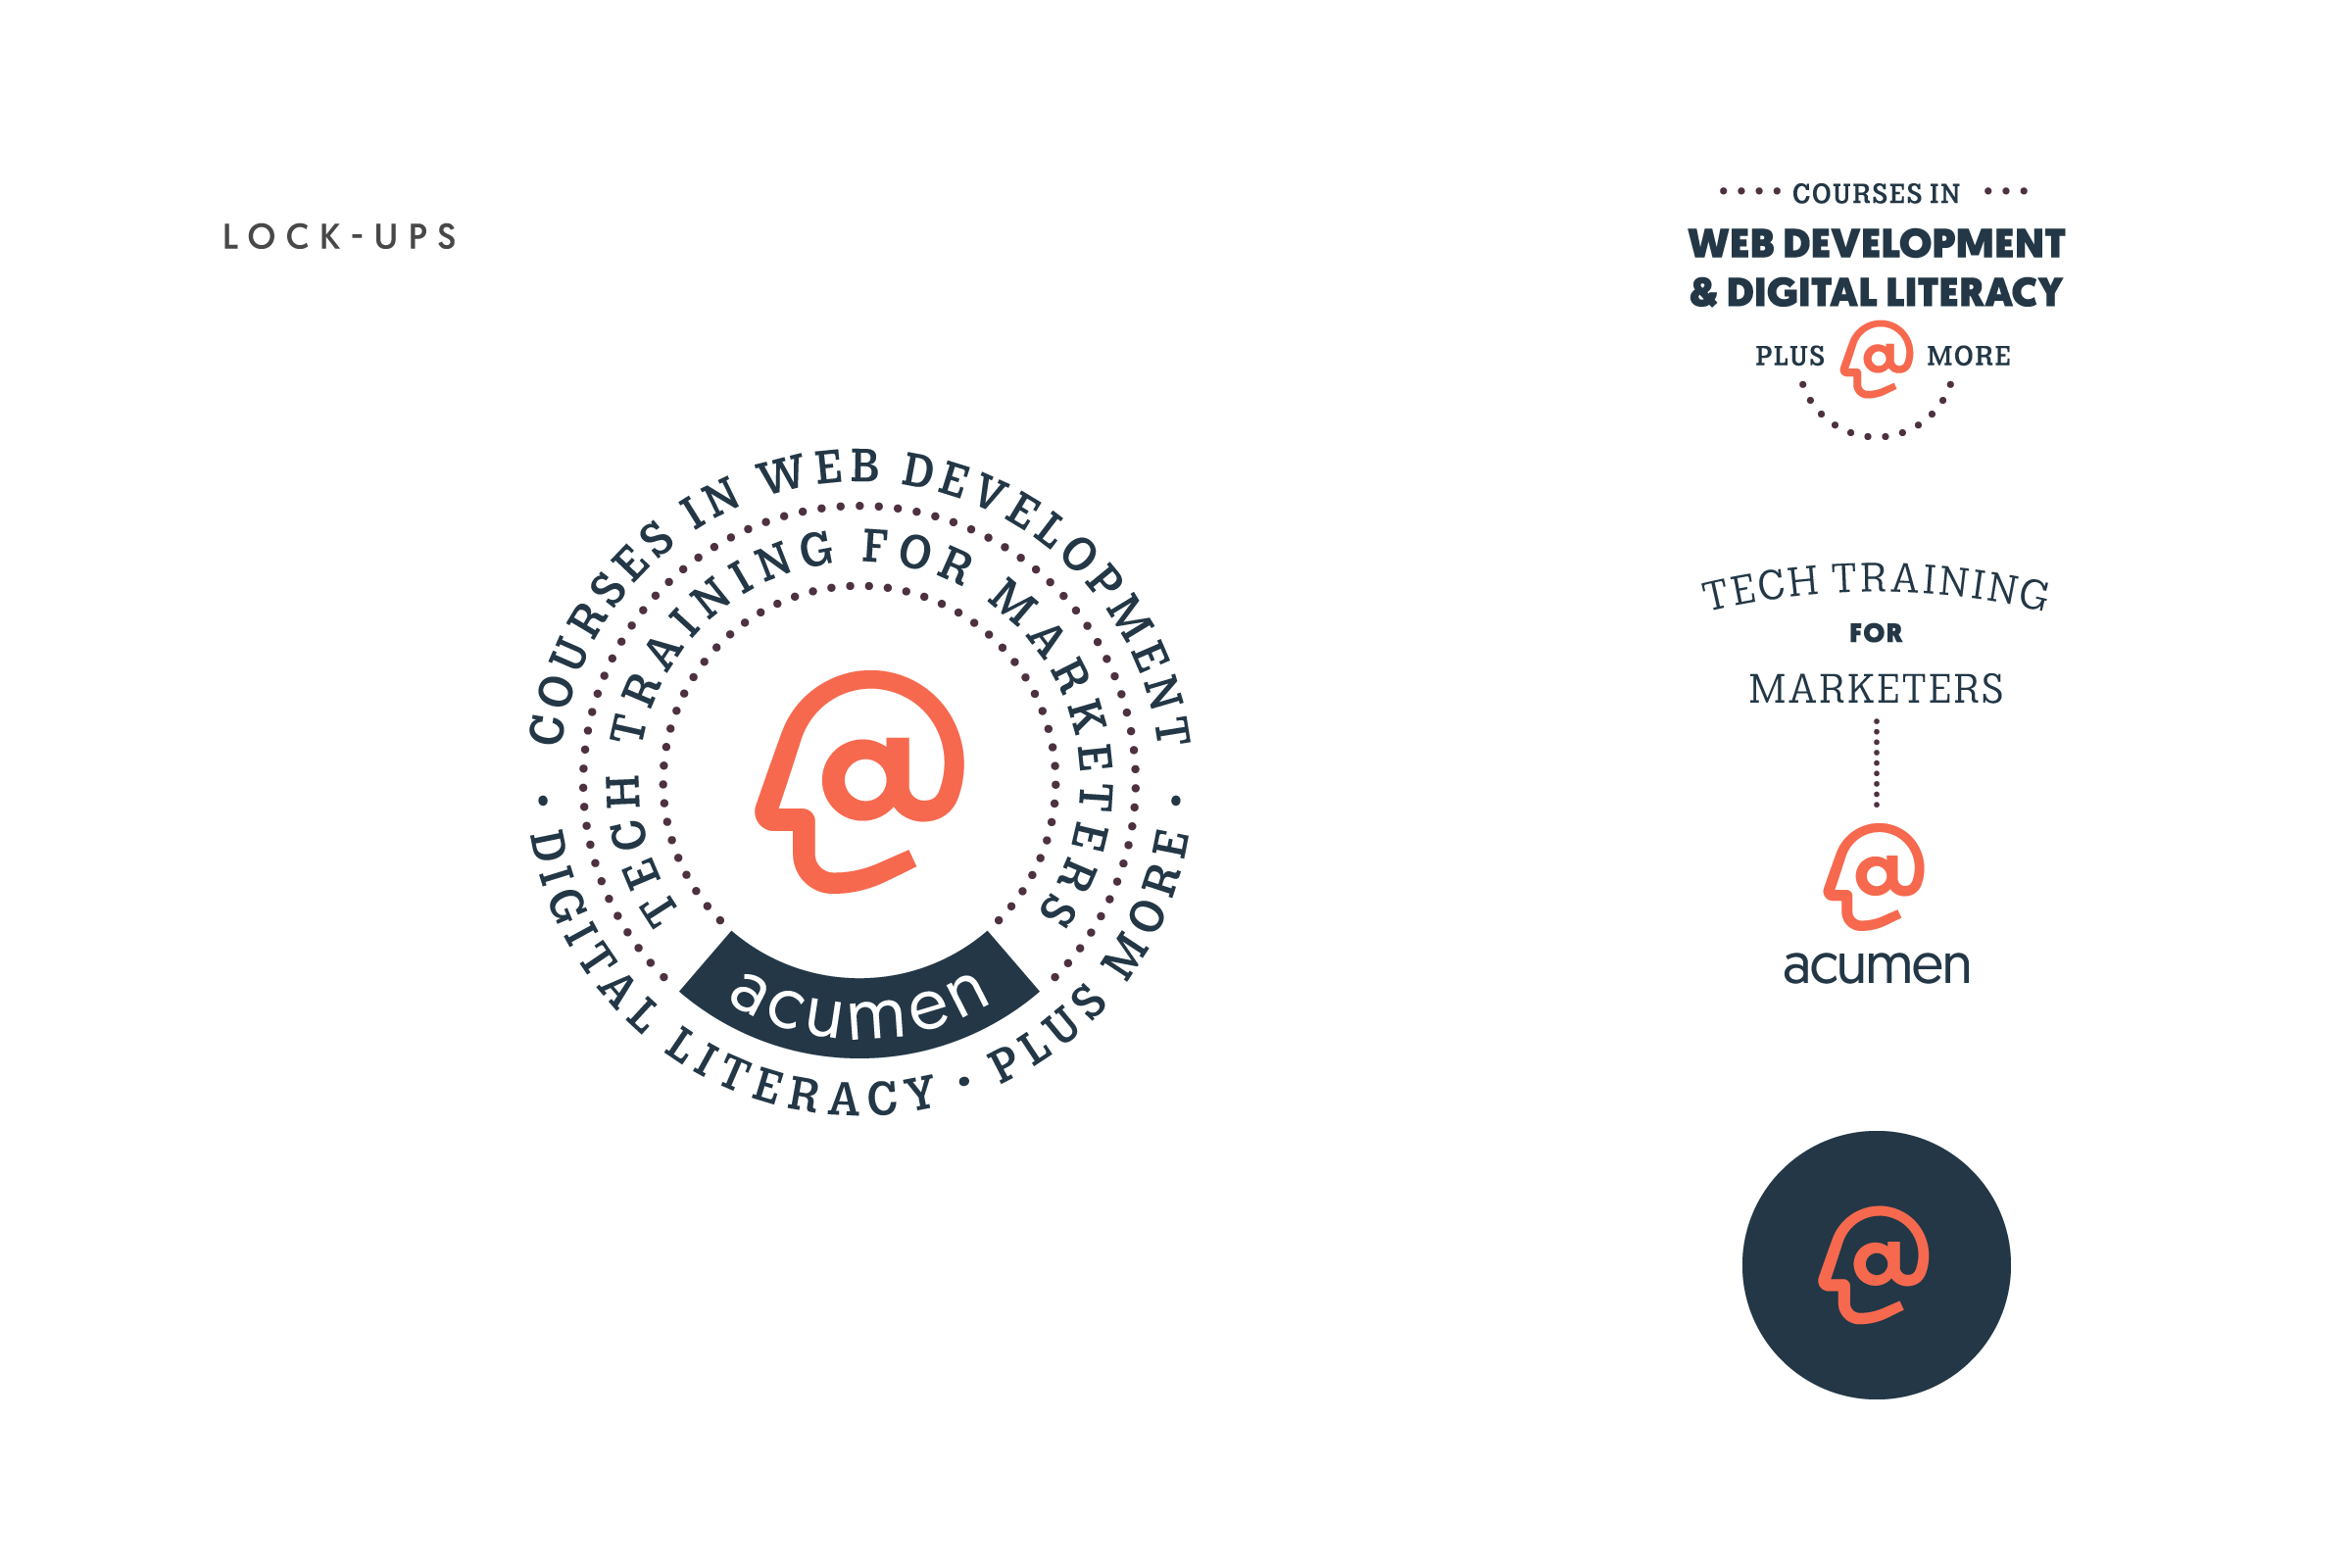 Diagram of the secondary logo assets designed for Acumen